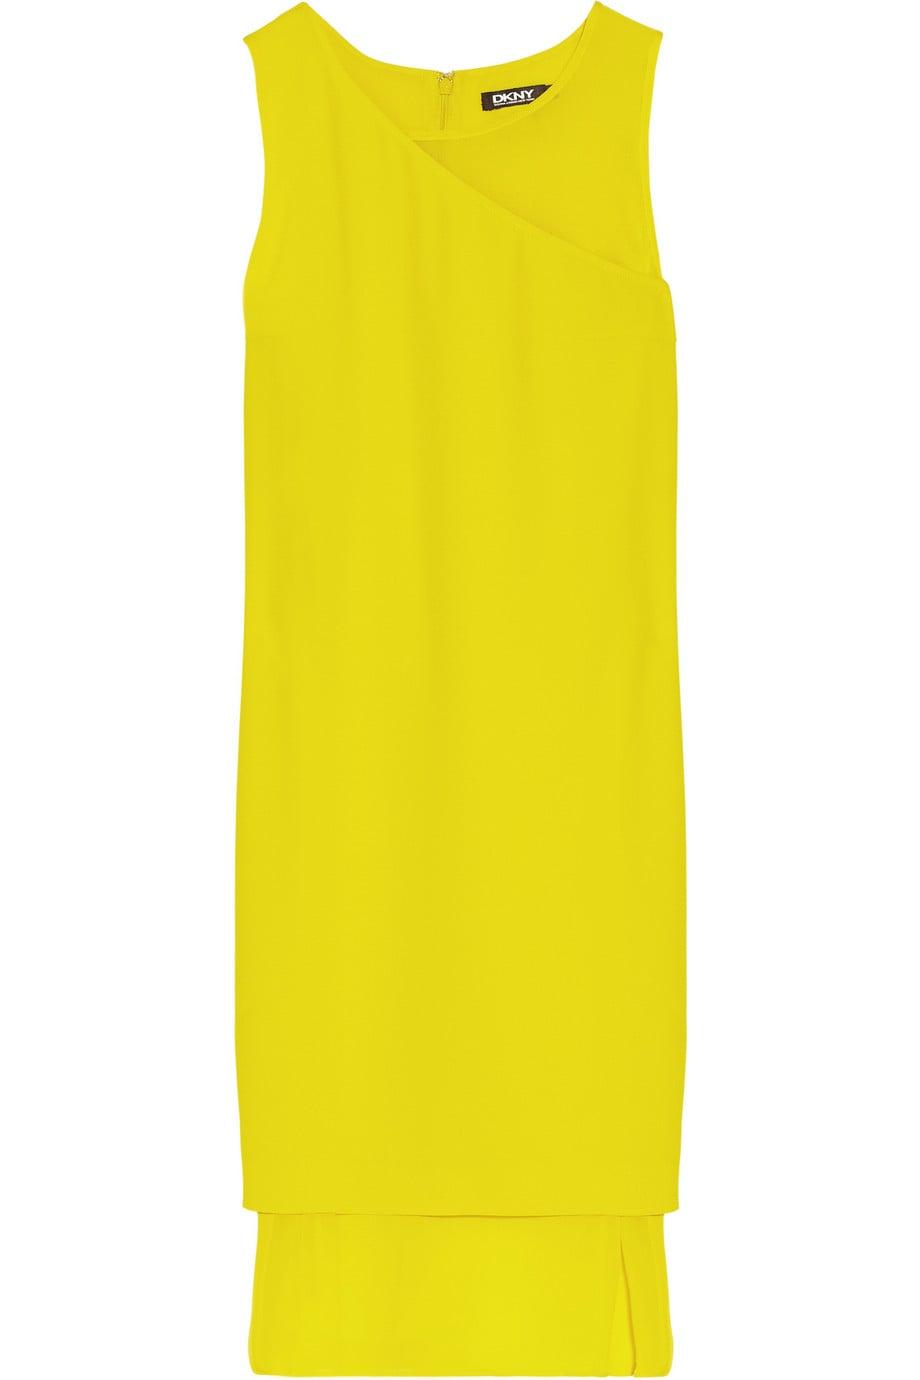 DKNY Yellow Dress